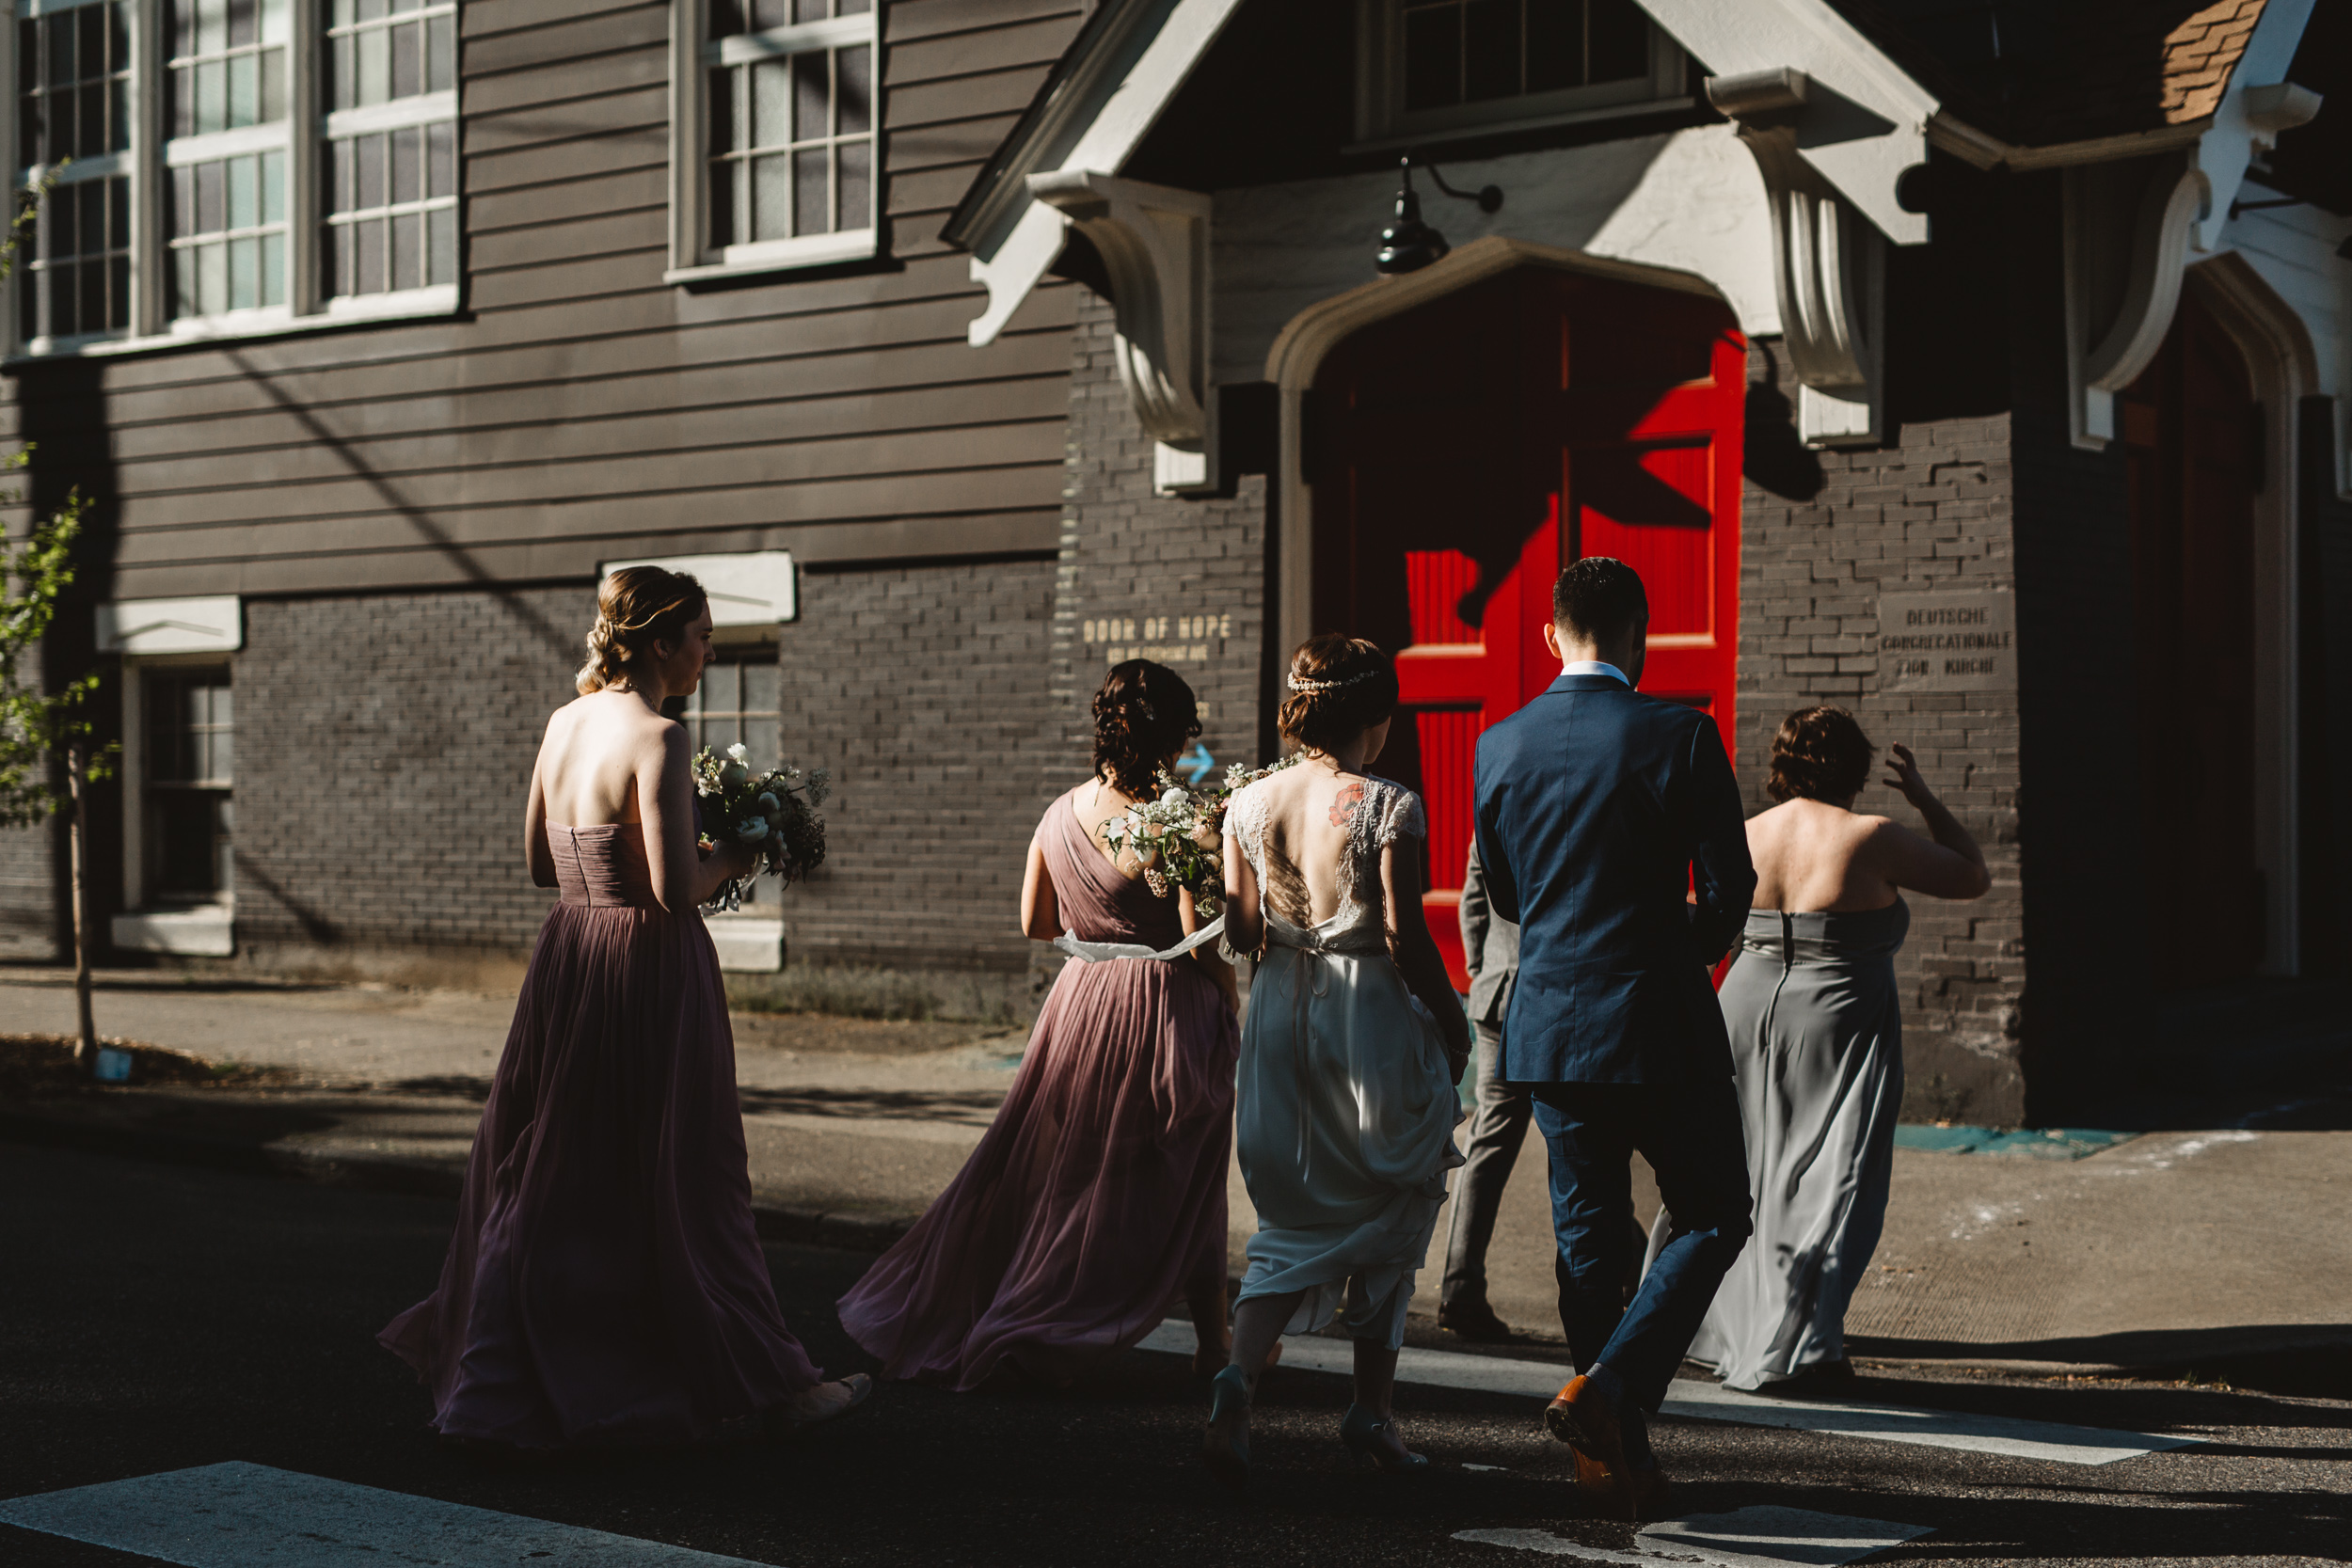 door-of-hope-wedding-portland-artistic-wedding-photography-2018.jpg